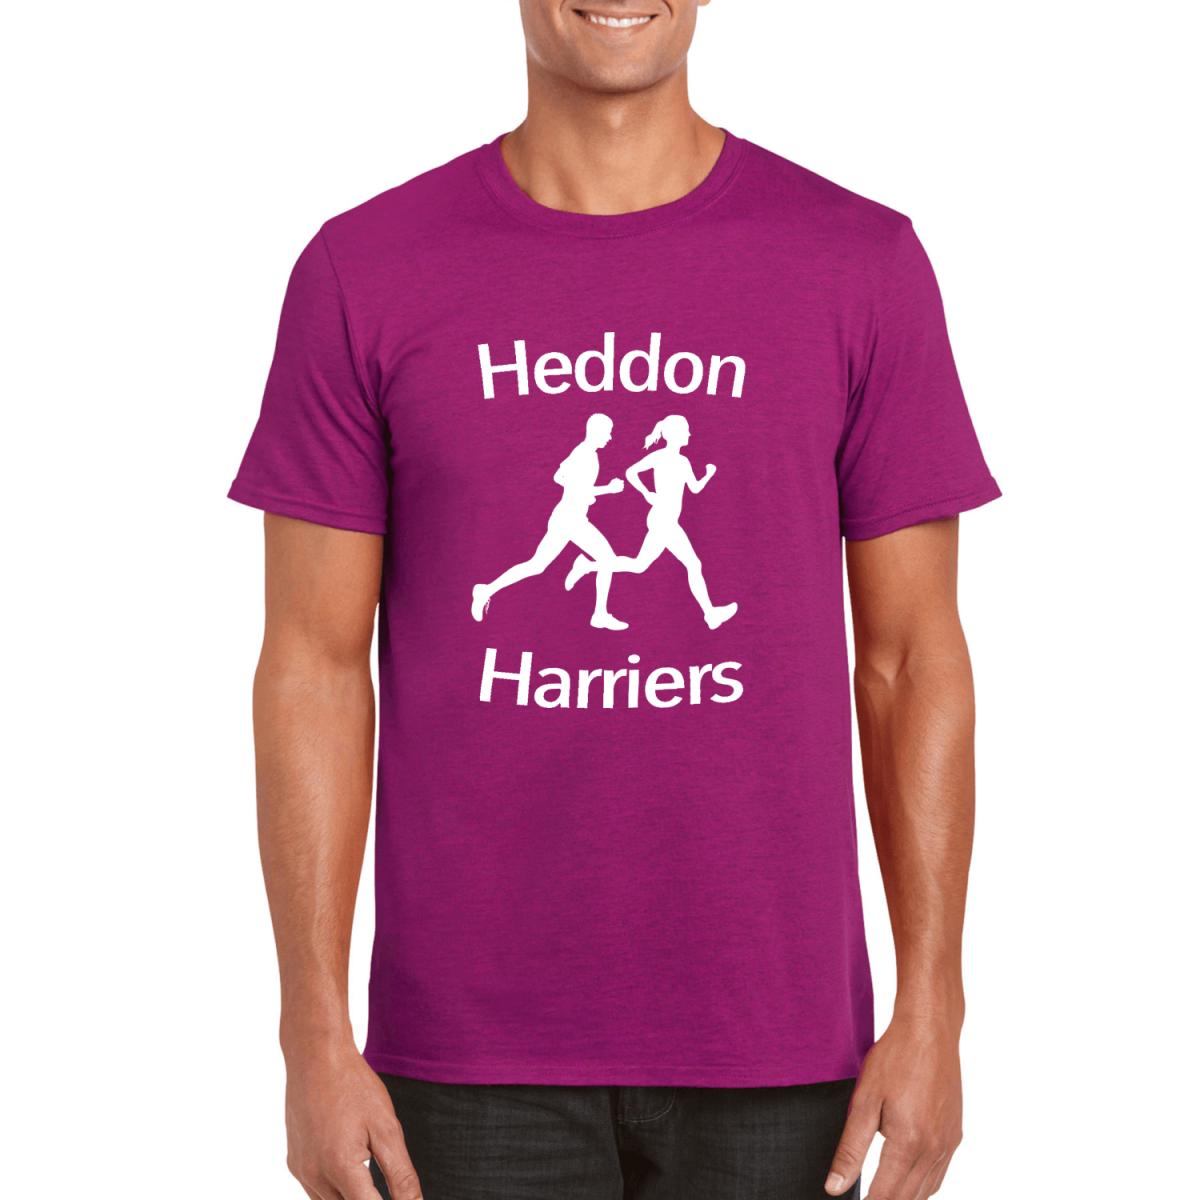 Custom Printed T-Shirt - Berry - Harriers